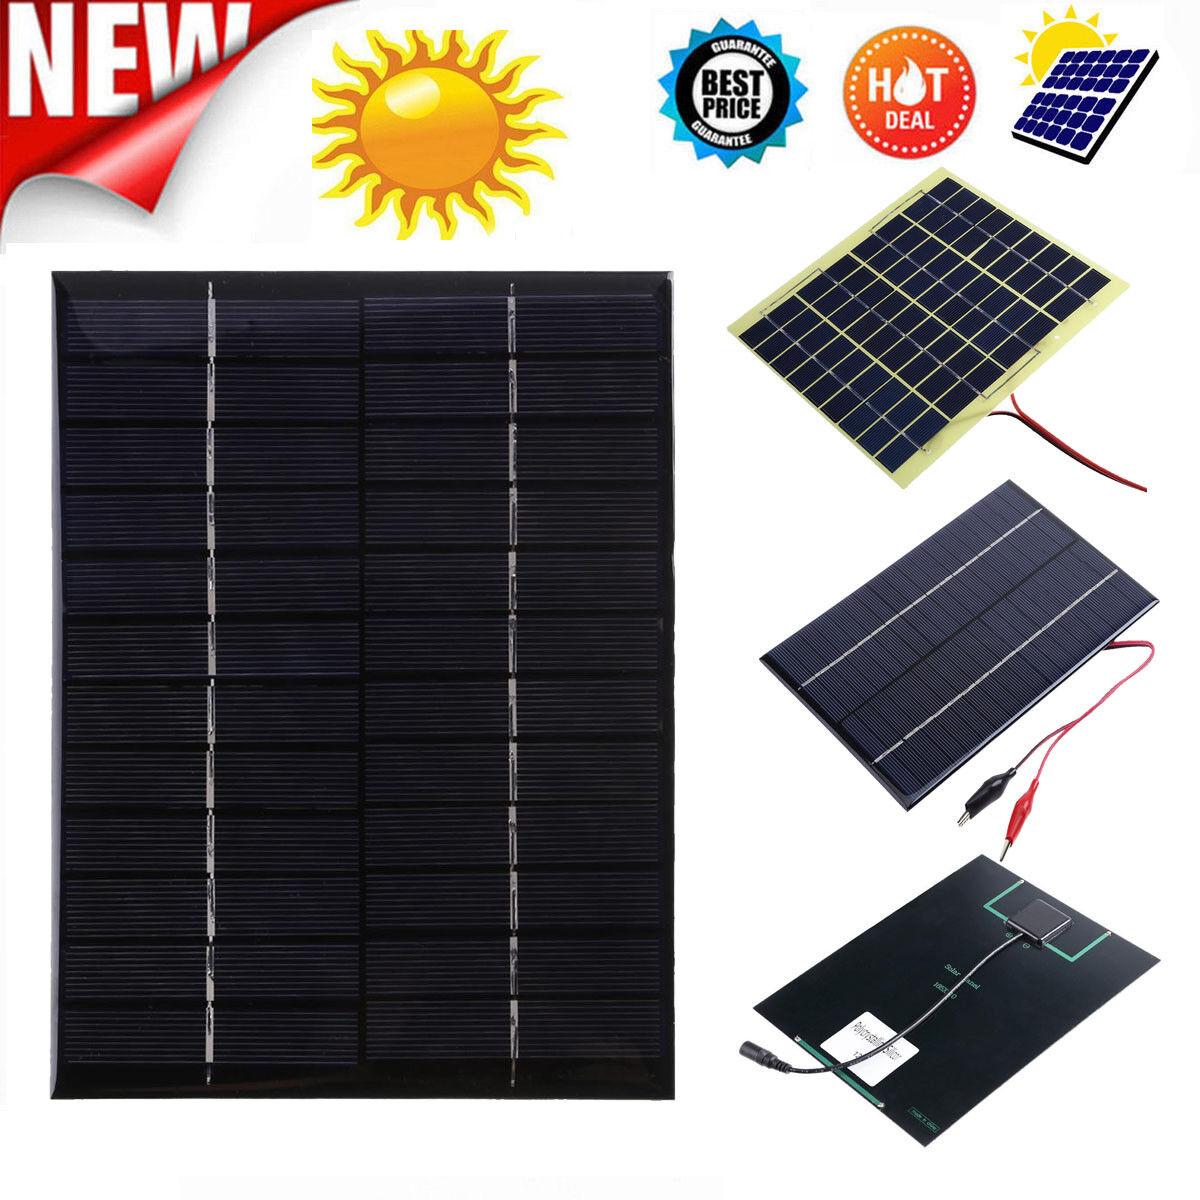 4x 125w Solar Panel Monocrystalline Module 12v Camping Battery Power Caravan For Sale Online Ebay